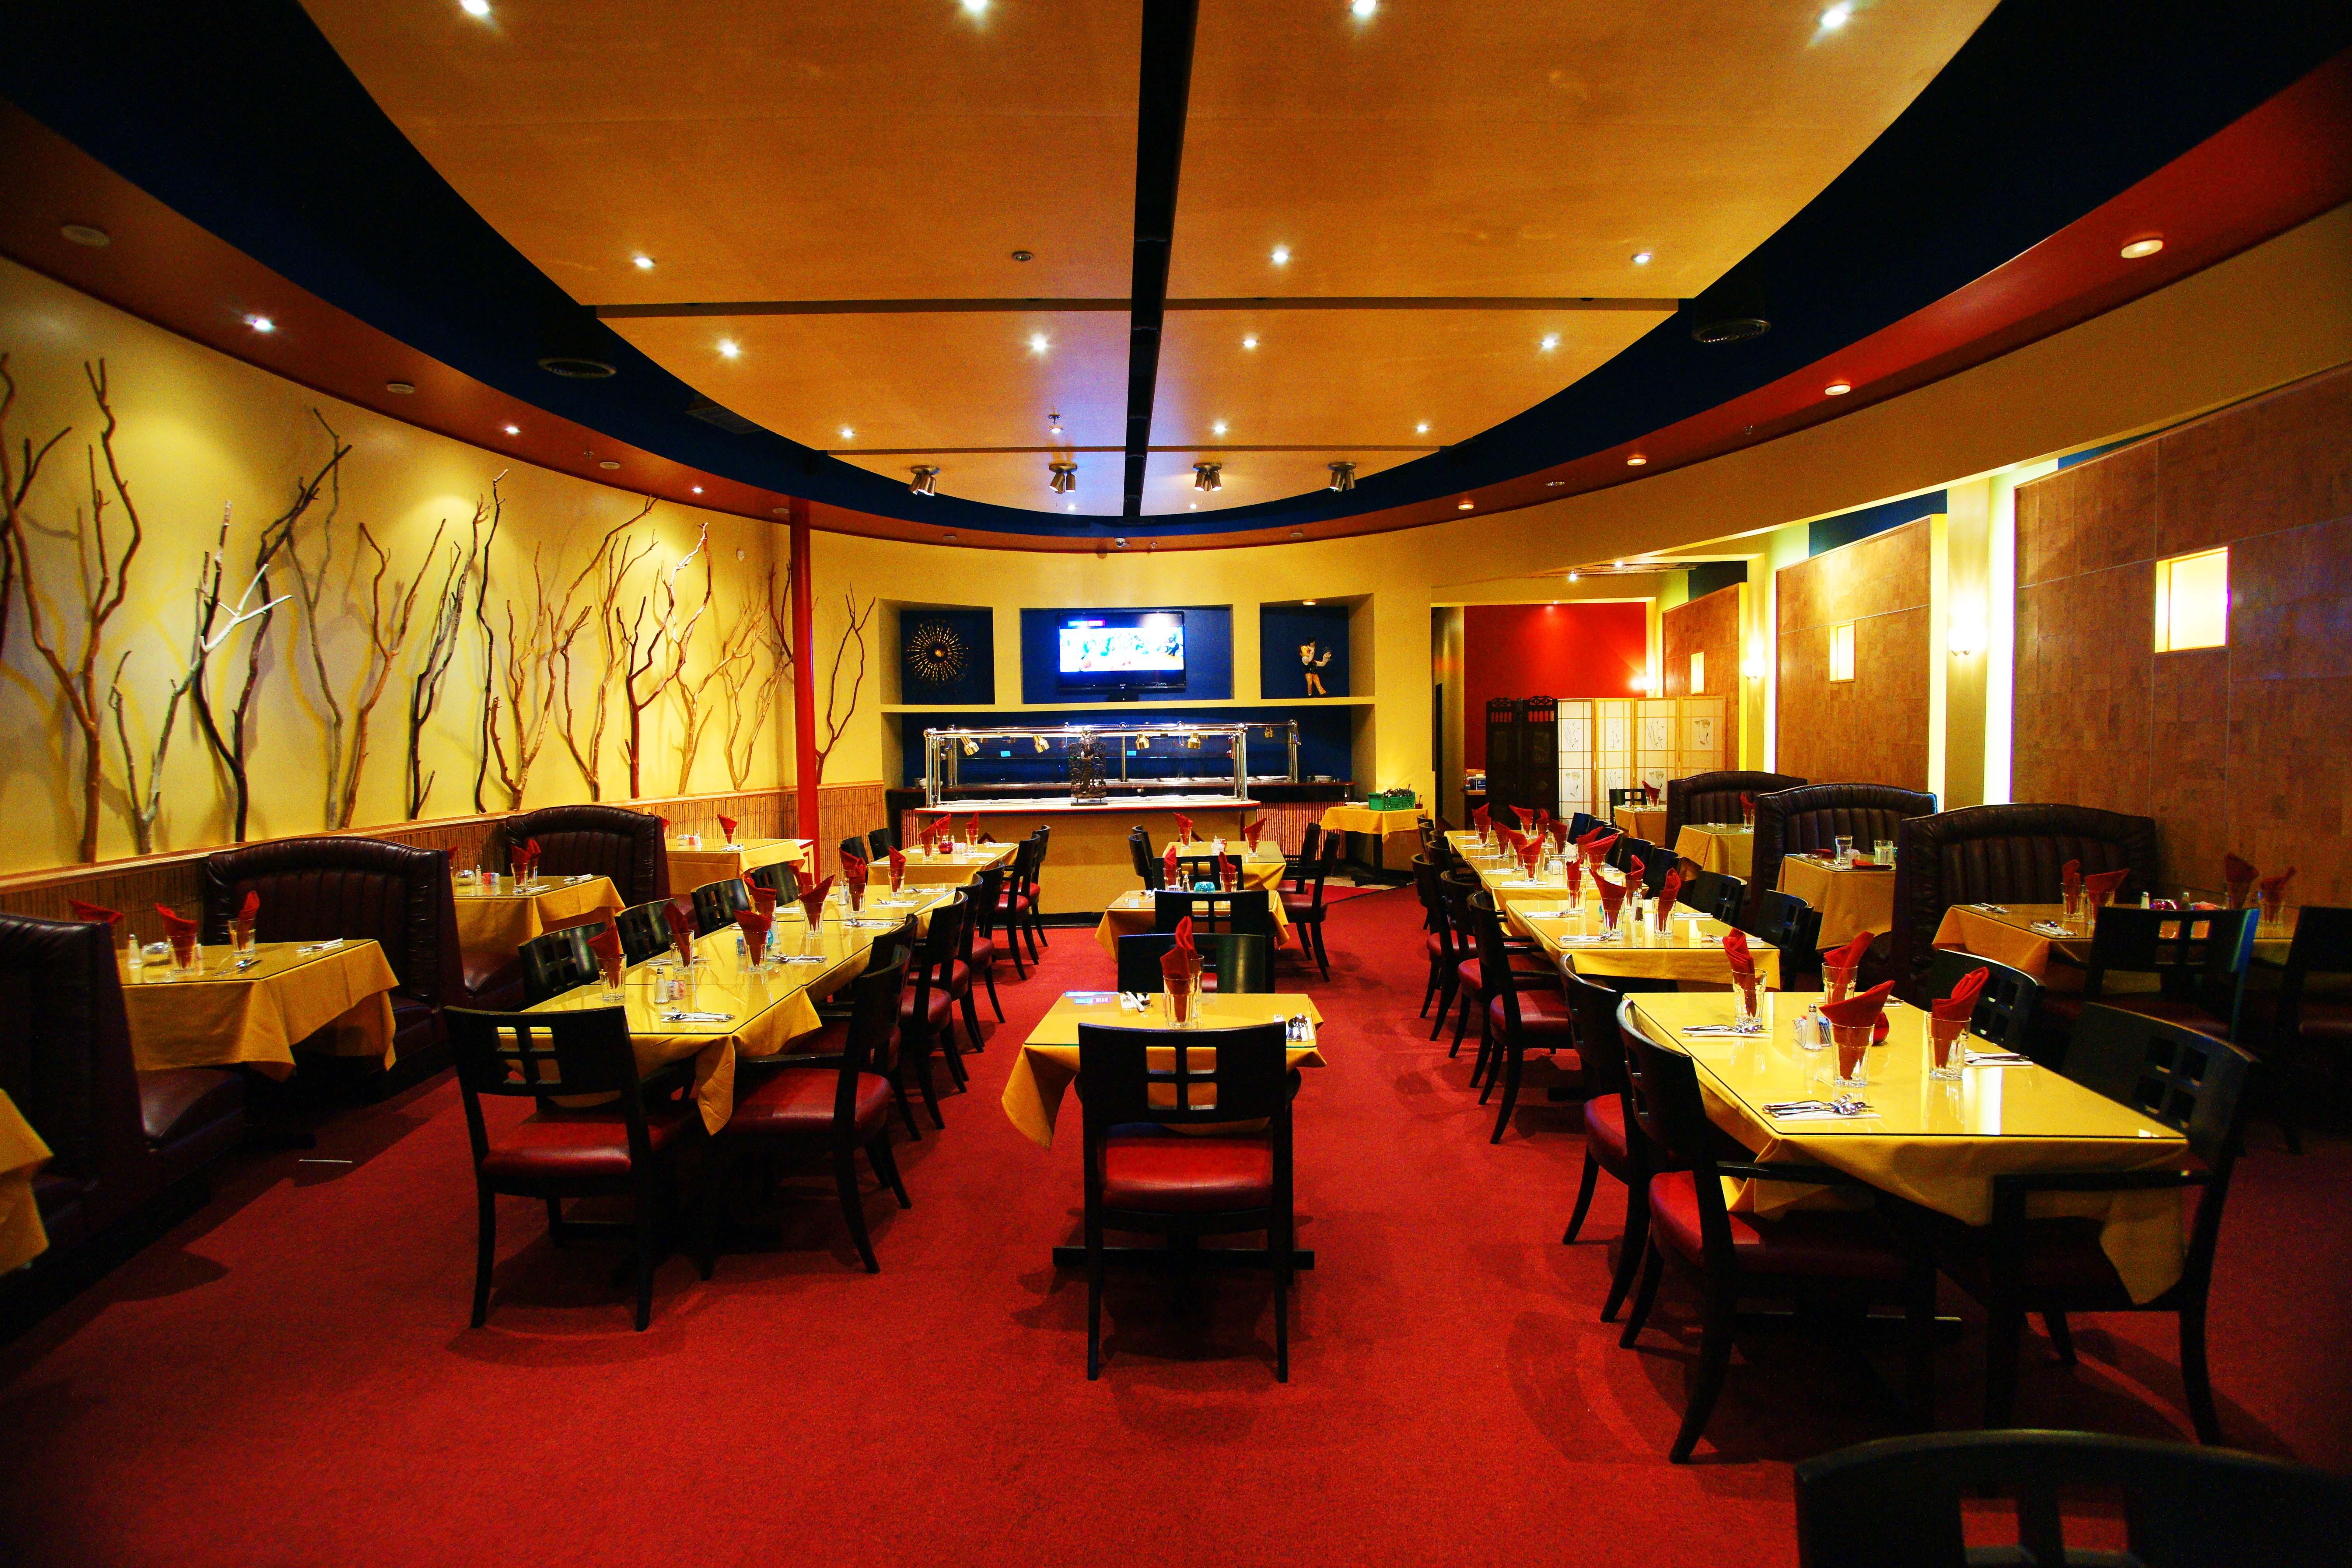 Nandhini Indian Restaurant Banquet Hall 208 Coit Rd Plano